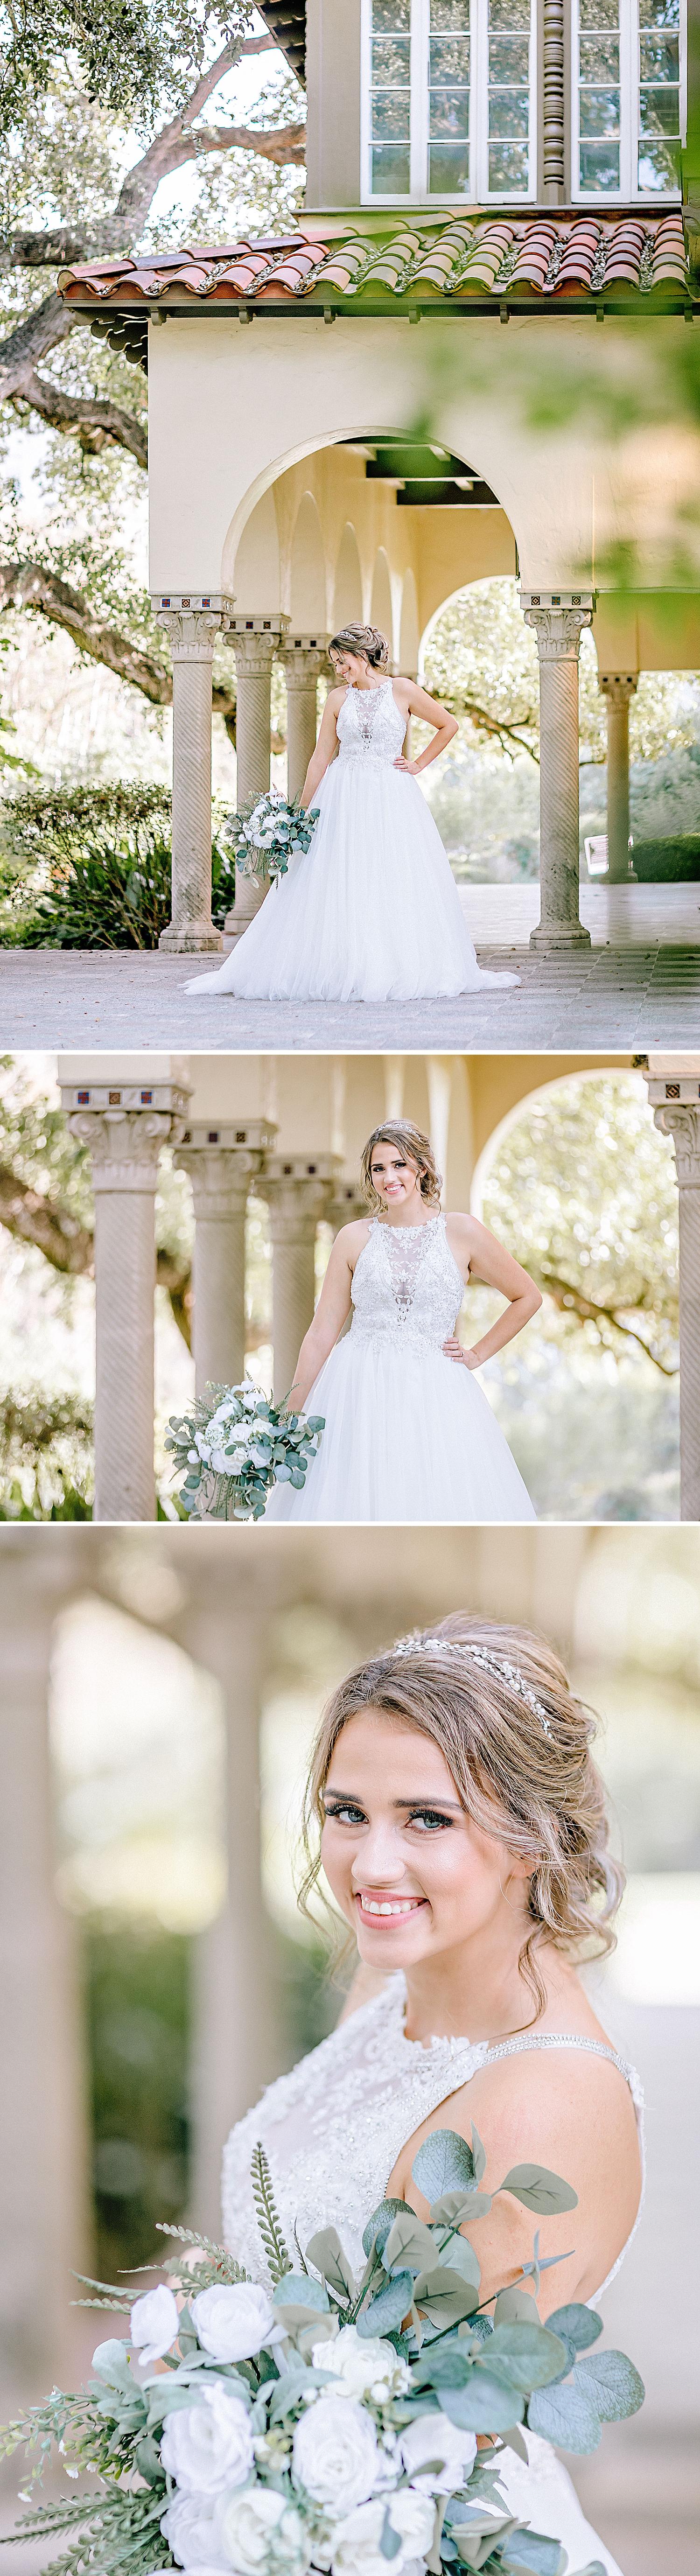 San-Antonio-Weddings-Bridal-Photos-Carly-Barton-Photography_0003.jpg